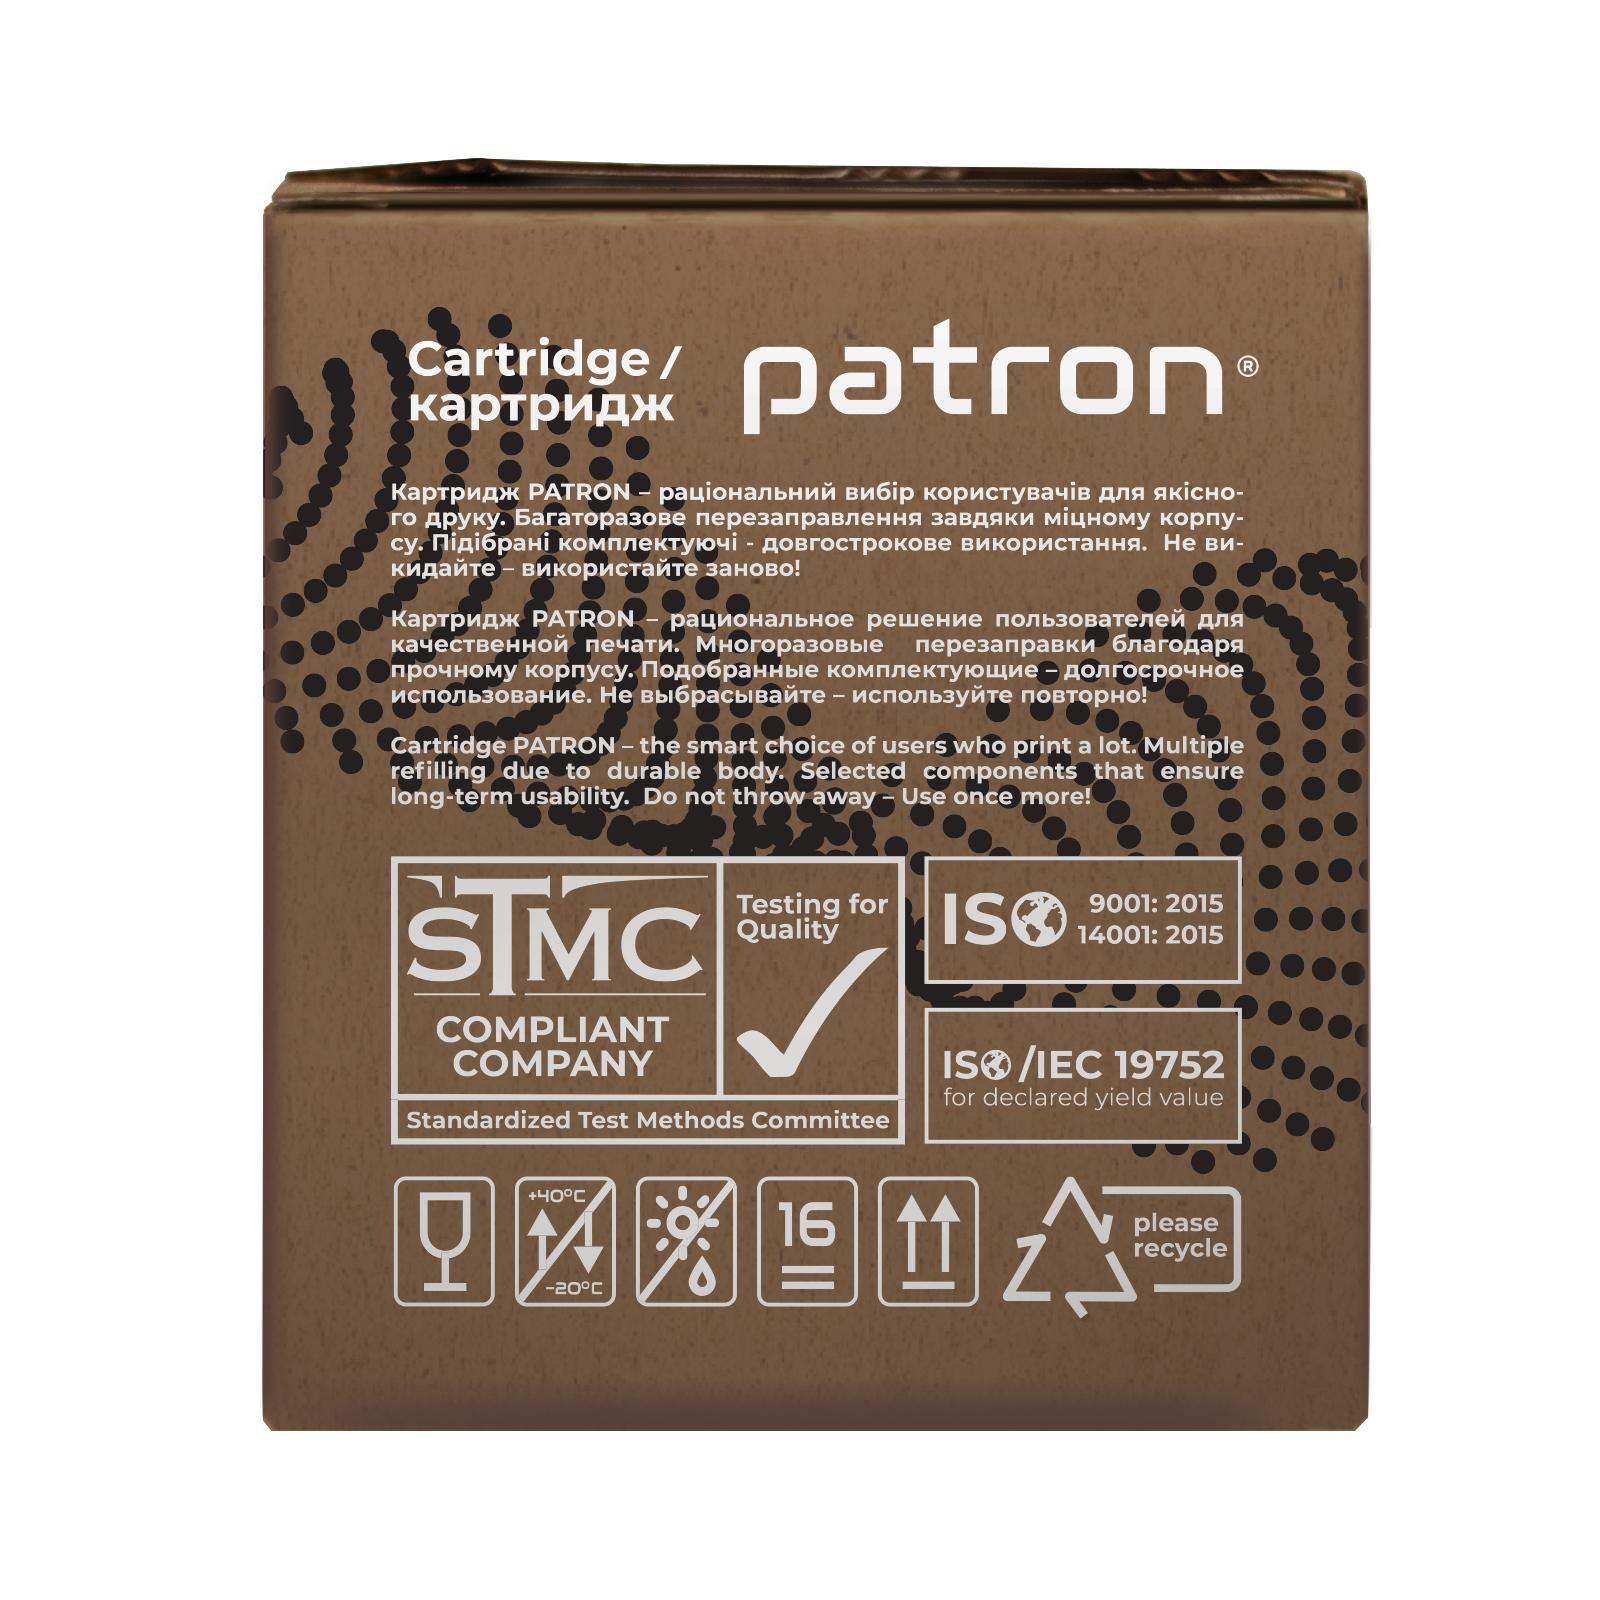 Картридж Patron CANON 728 GREEN Label (PN-728GL) изображение 4